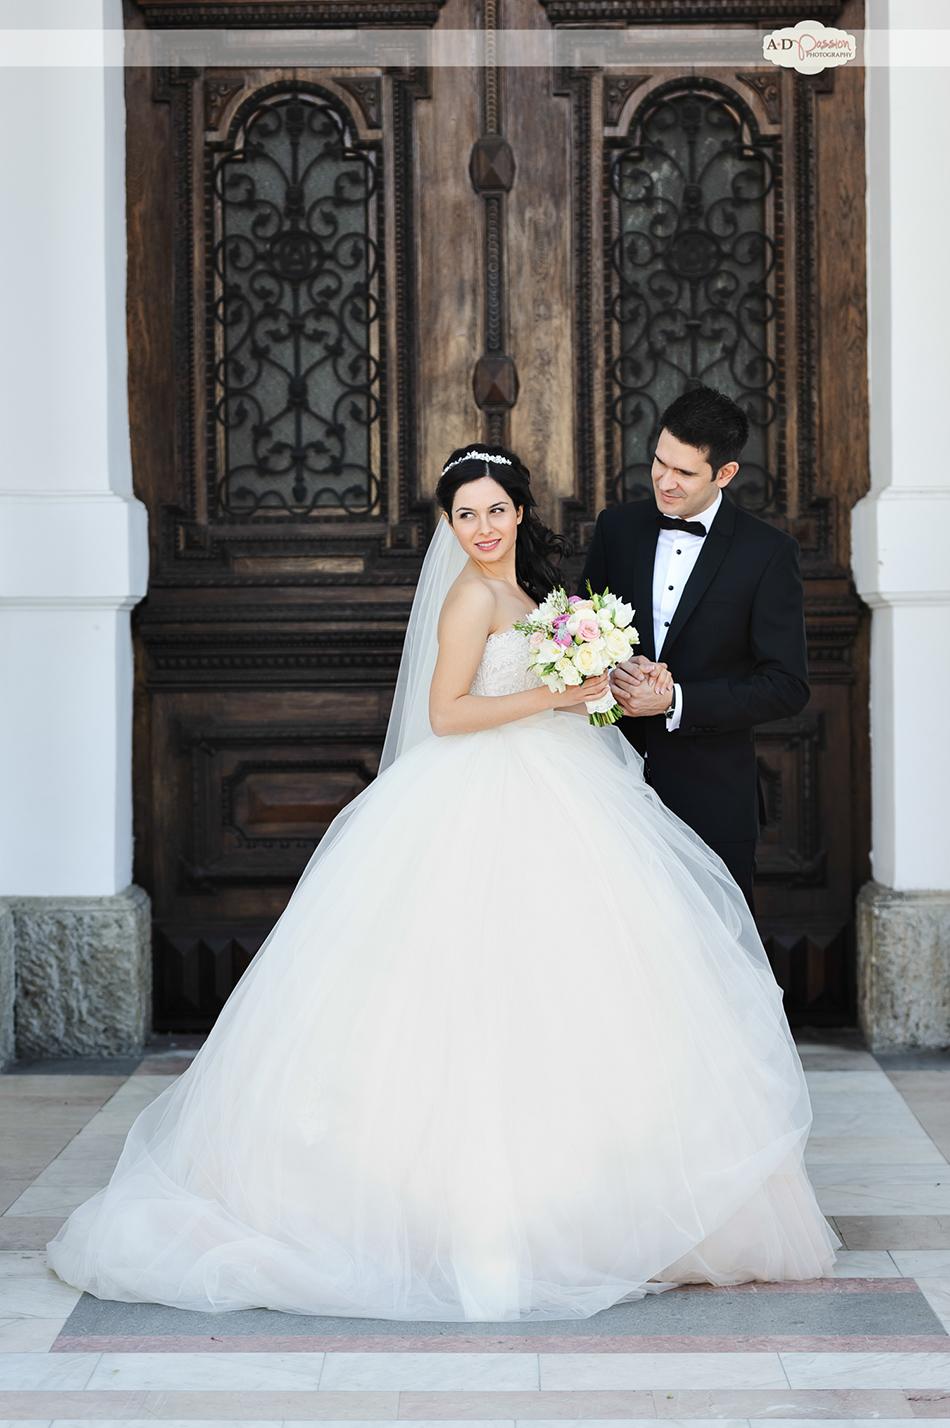 AD Passion Photography | fotograf-profesionist-de-nunta-arad-timisoara-bucuresti_madalina+mihnea_0101 | Adelin, Dida, fotograf profesionist, fotograf de nunta, fotografie de nunta, fotograf Timisoara, fotograf Craiova, fotograf Bucuresti, fotograf Arad, nunta Timisoara, nunta Arad, nunta Bucuresti, nunta Craiova